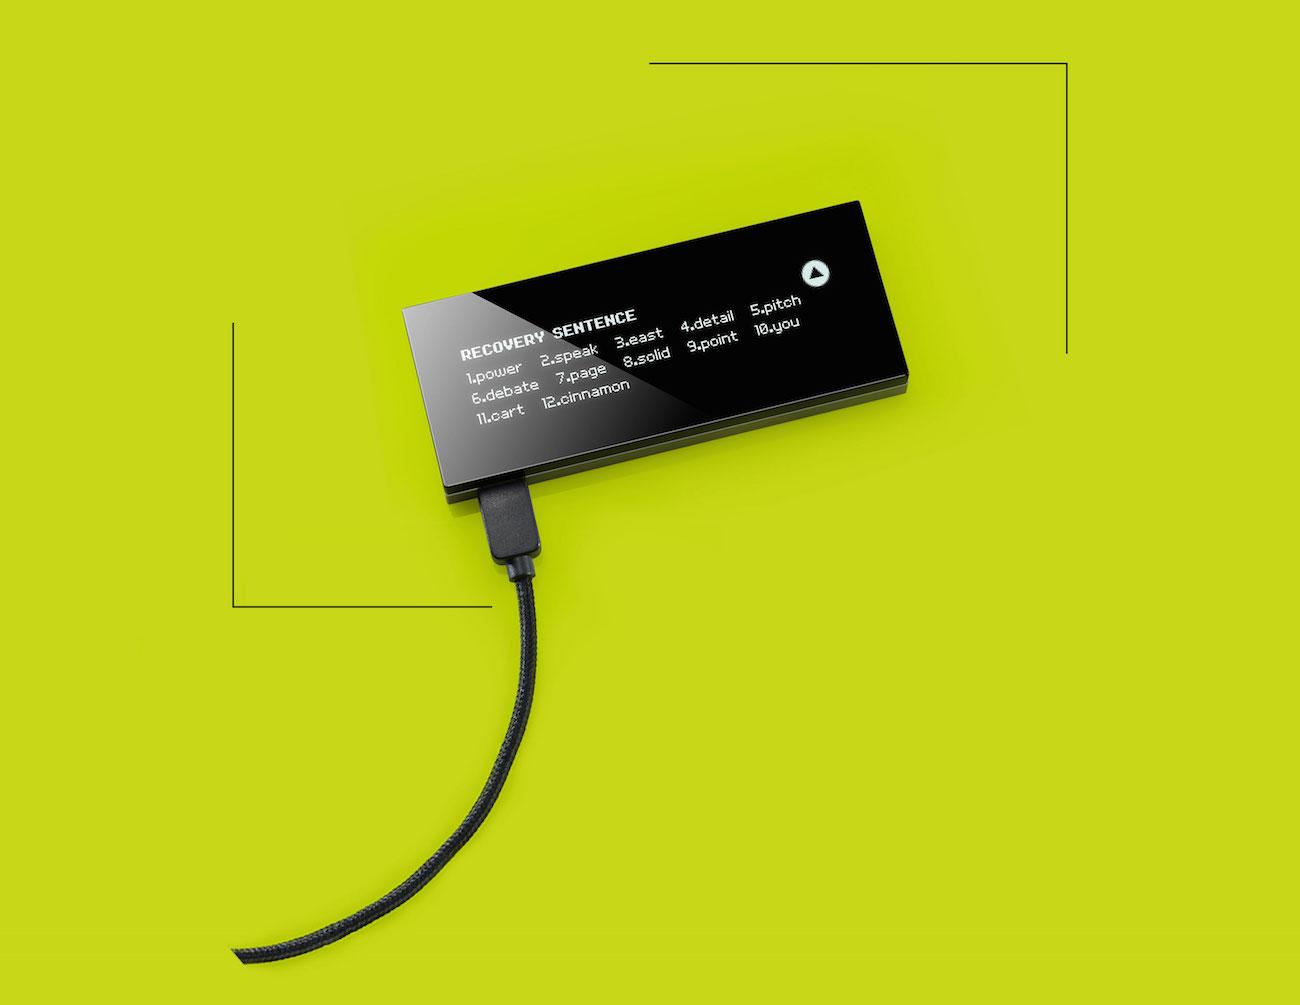 Hardware Bitcoin Wallet